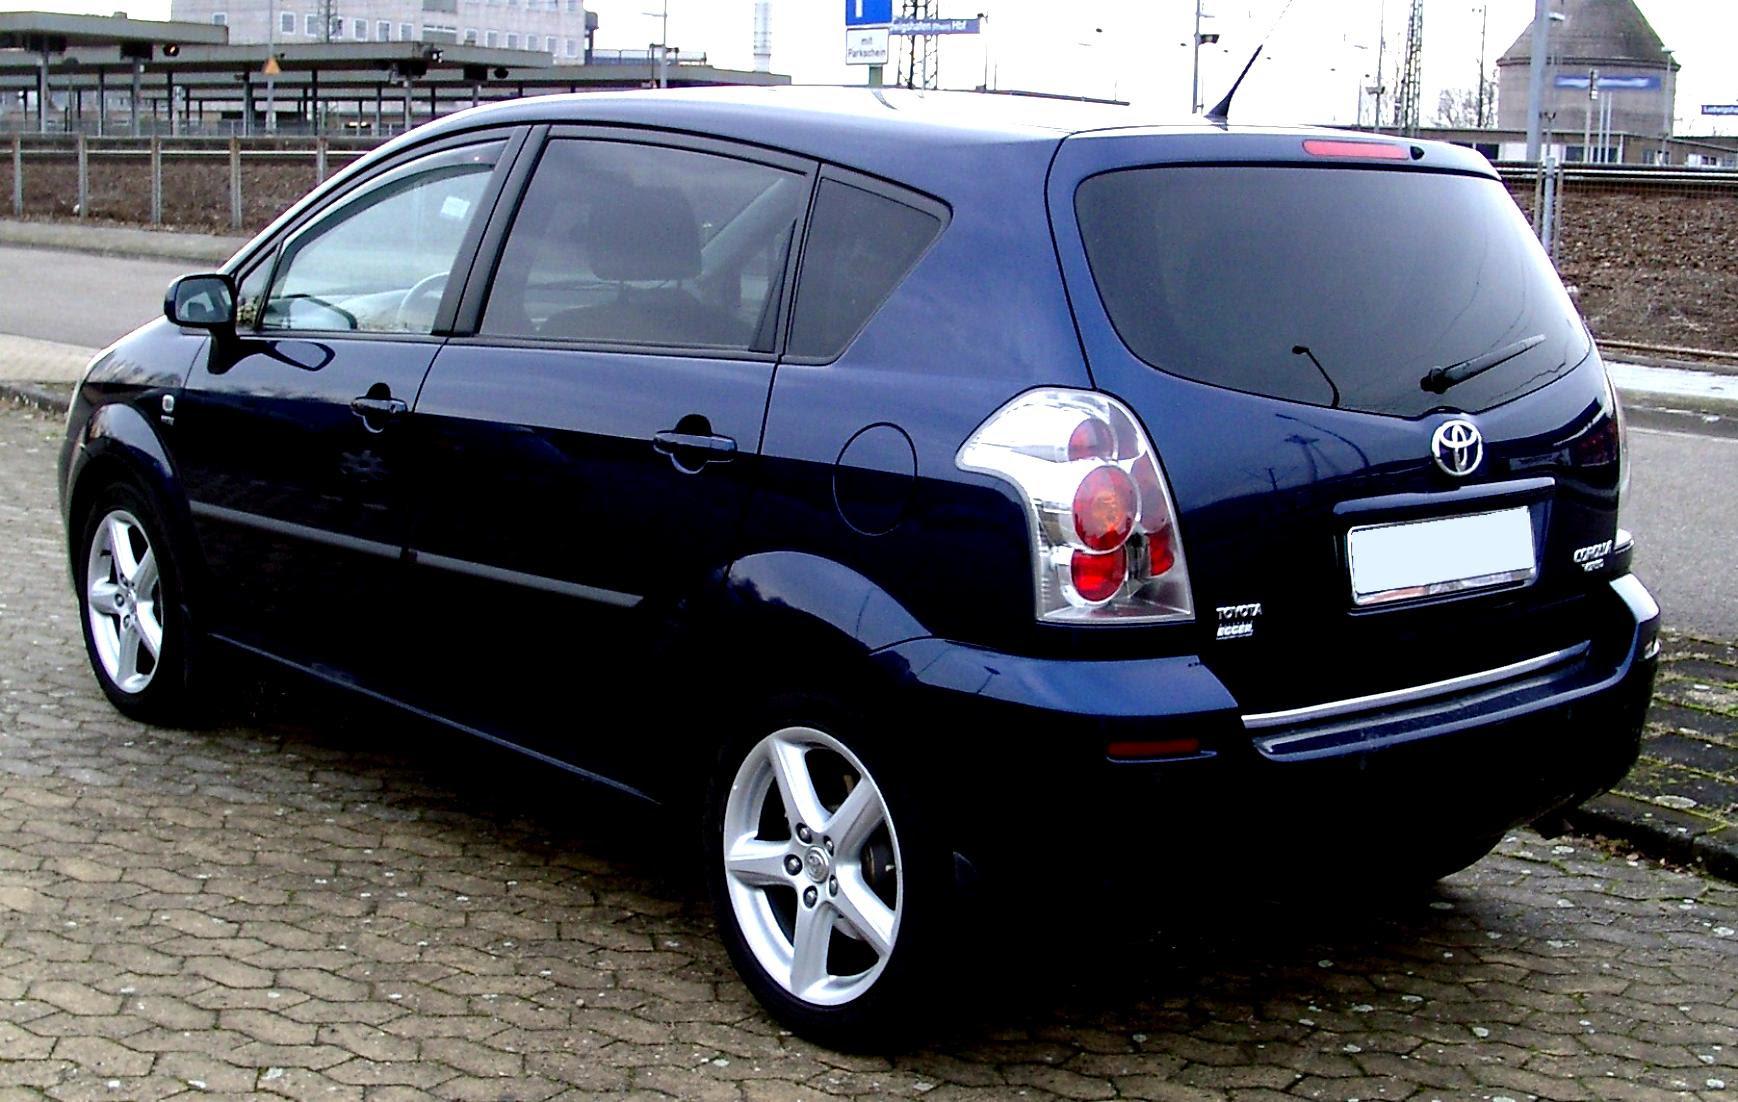 Toyota Corolla Verso 2002 On Motoimg Com